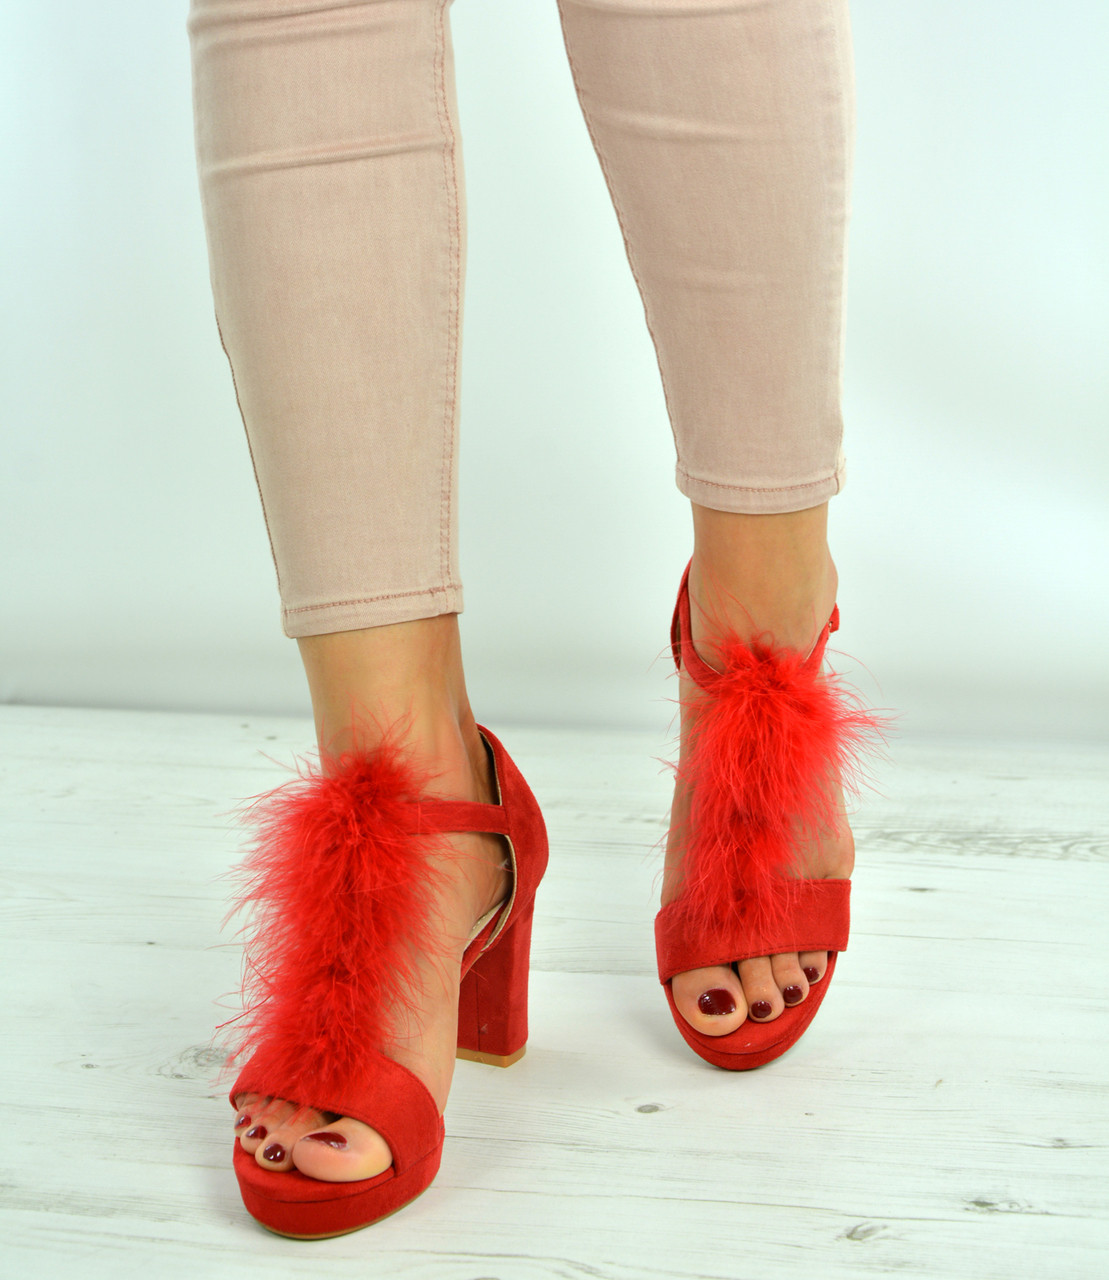 556992e73c6 New Womens Fur Block Heel Sandals Ladies Platforms Ankle Strap Shoes Size  Uk 3-8